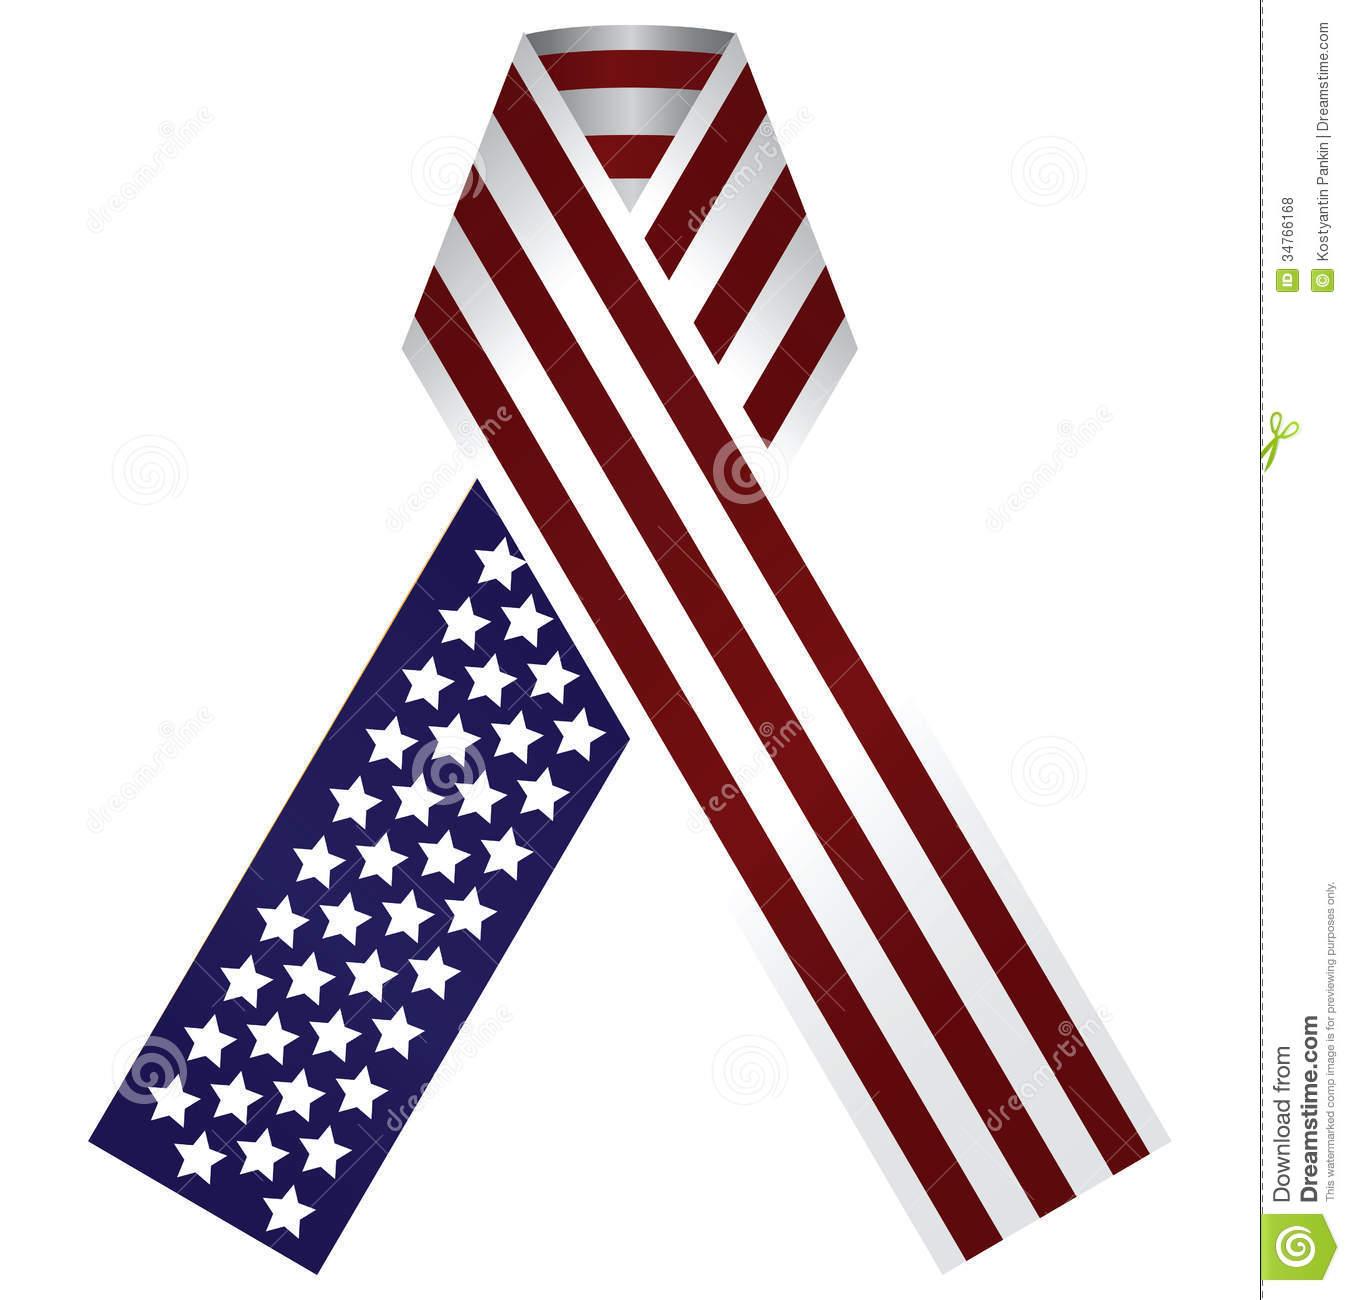 American flag ribon clipart.